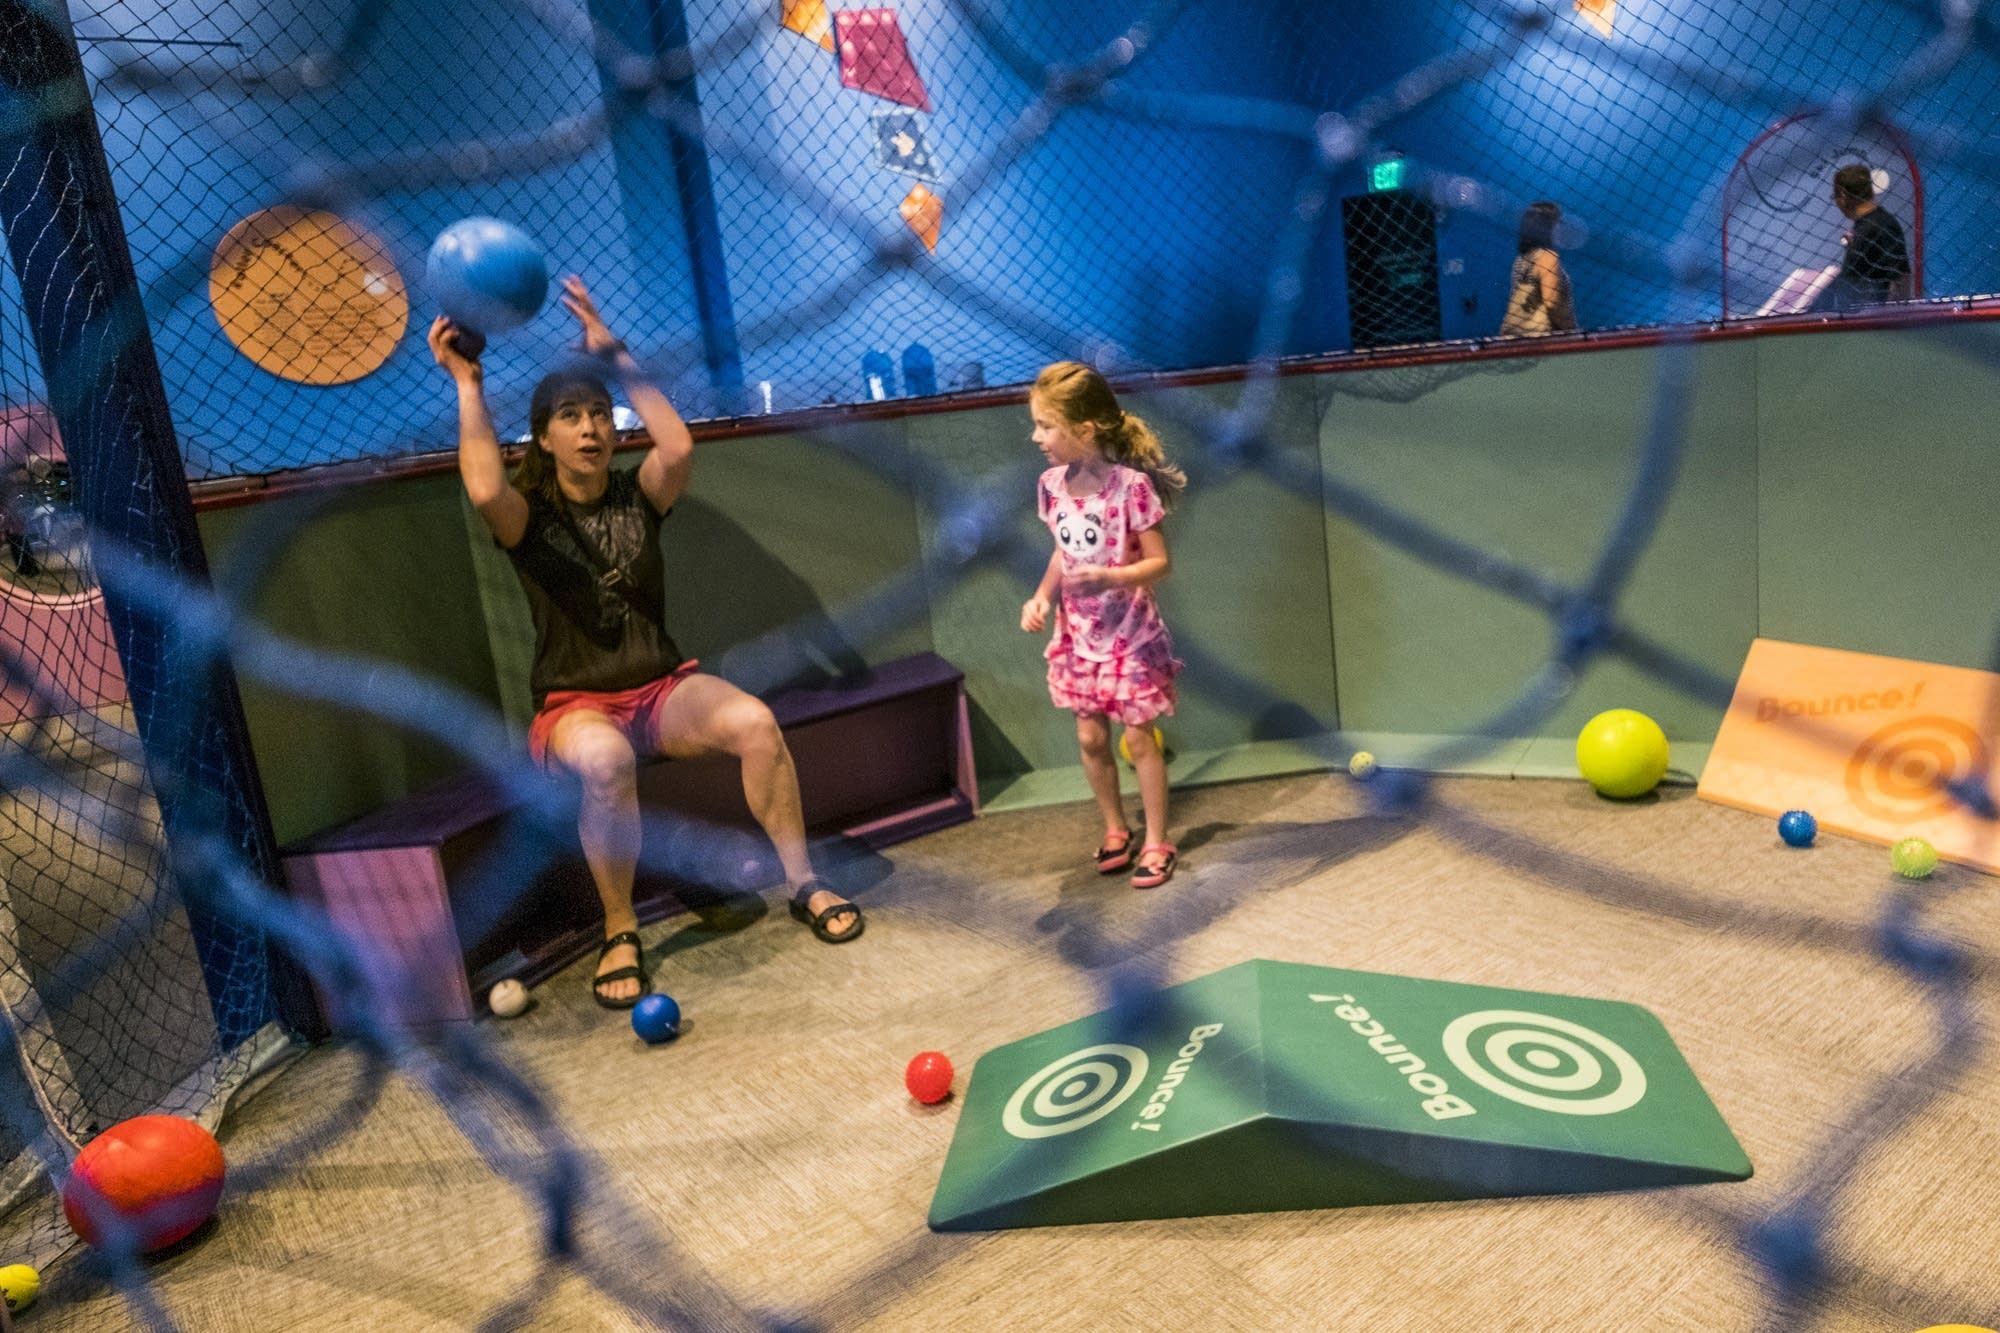 Briar and Jaimee Lamm play in the Ball-O-Rama room.